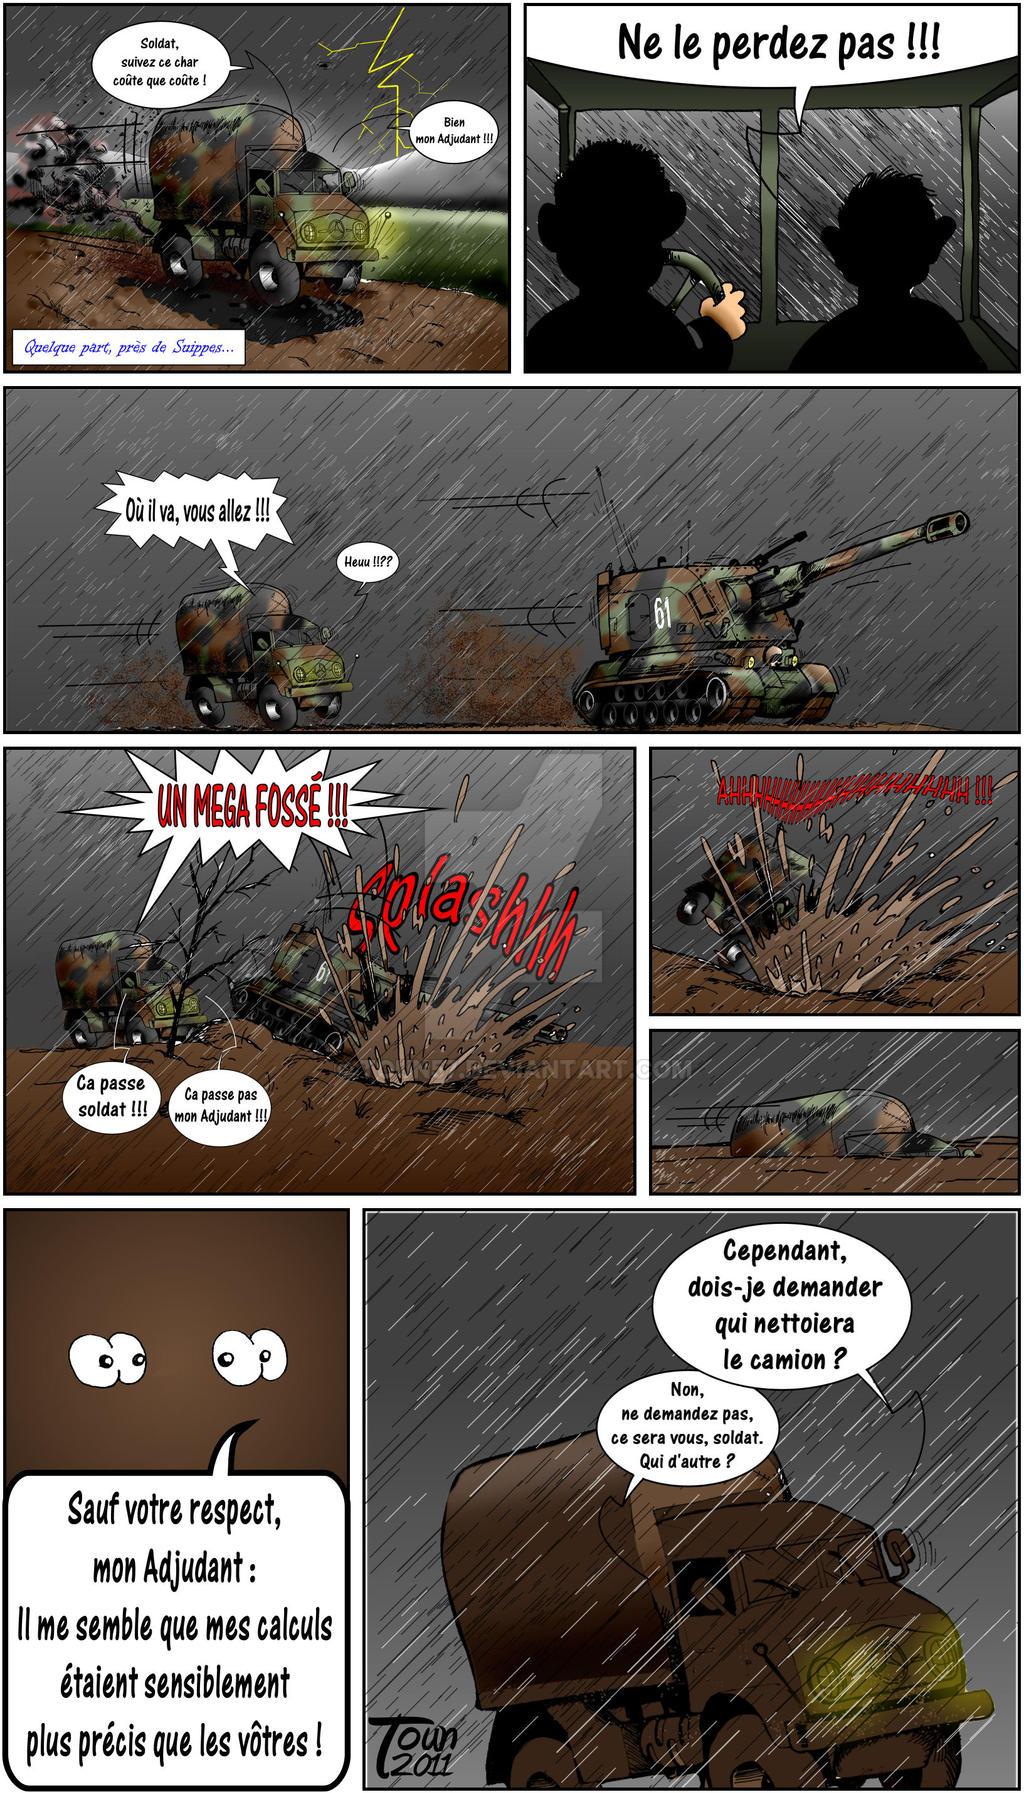 militaire du rang 2 by toun57 on deviantart